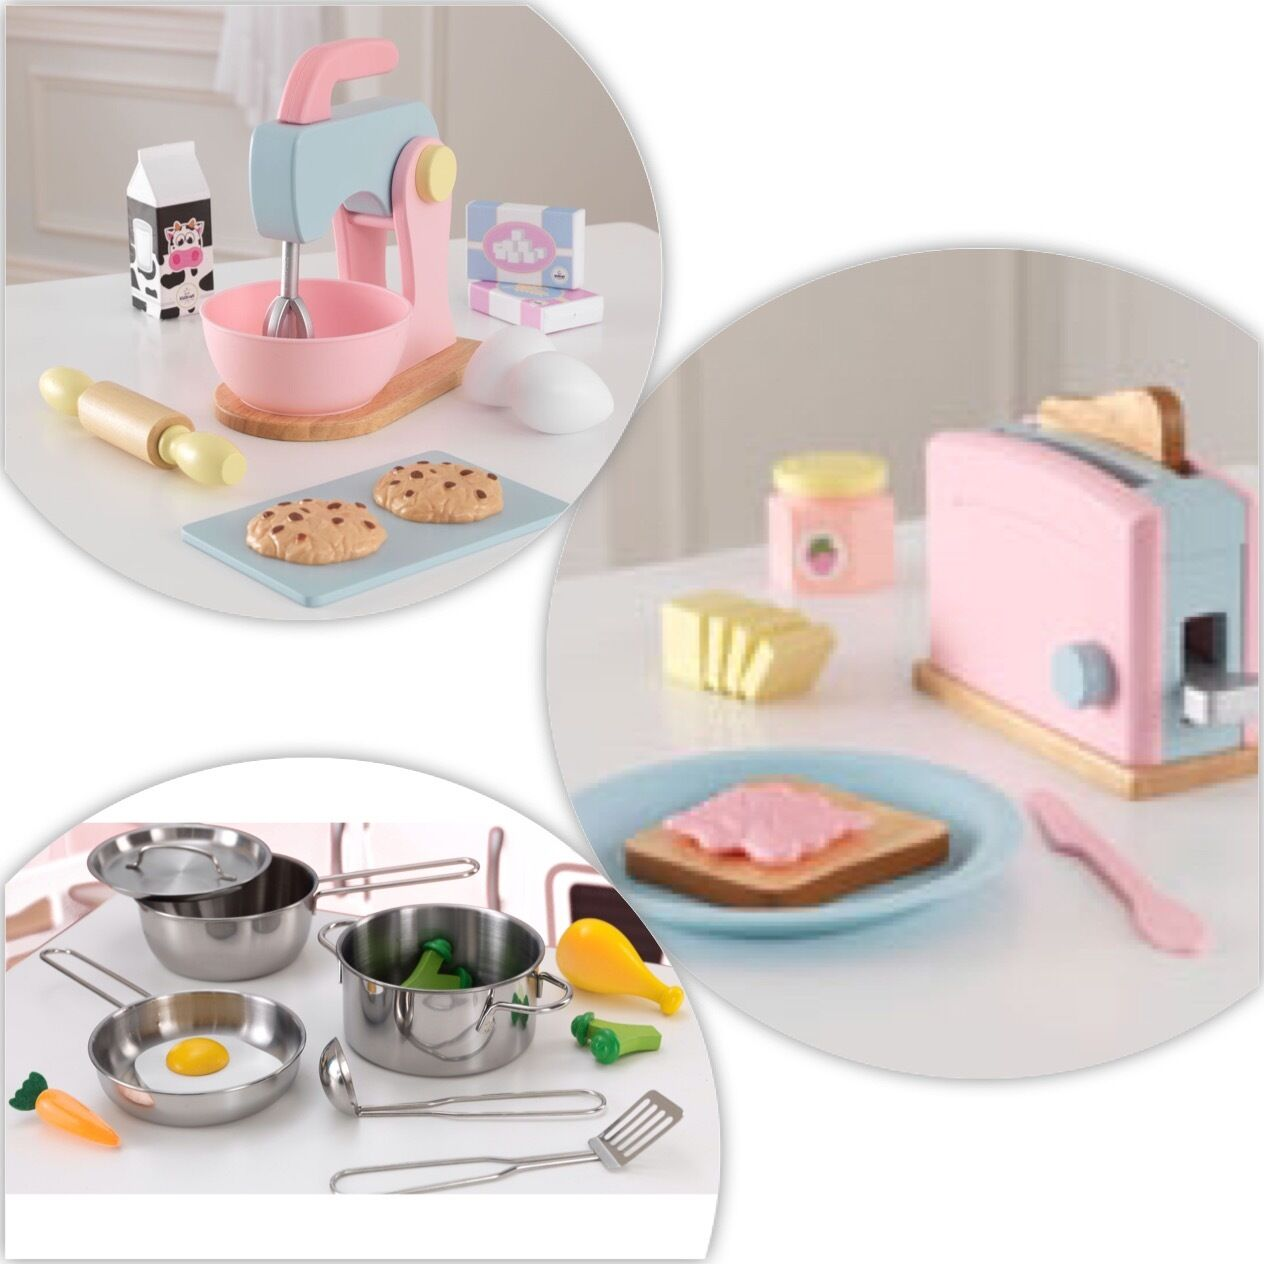 3 Kidcraft Sats ( Pastel Baking set, Pastel Toaster Set, Pots och Pans)